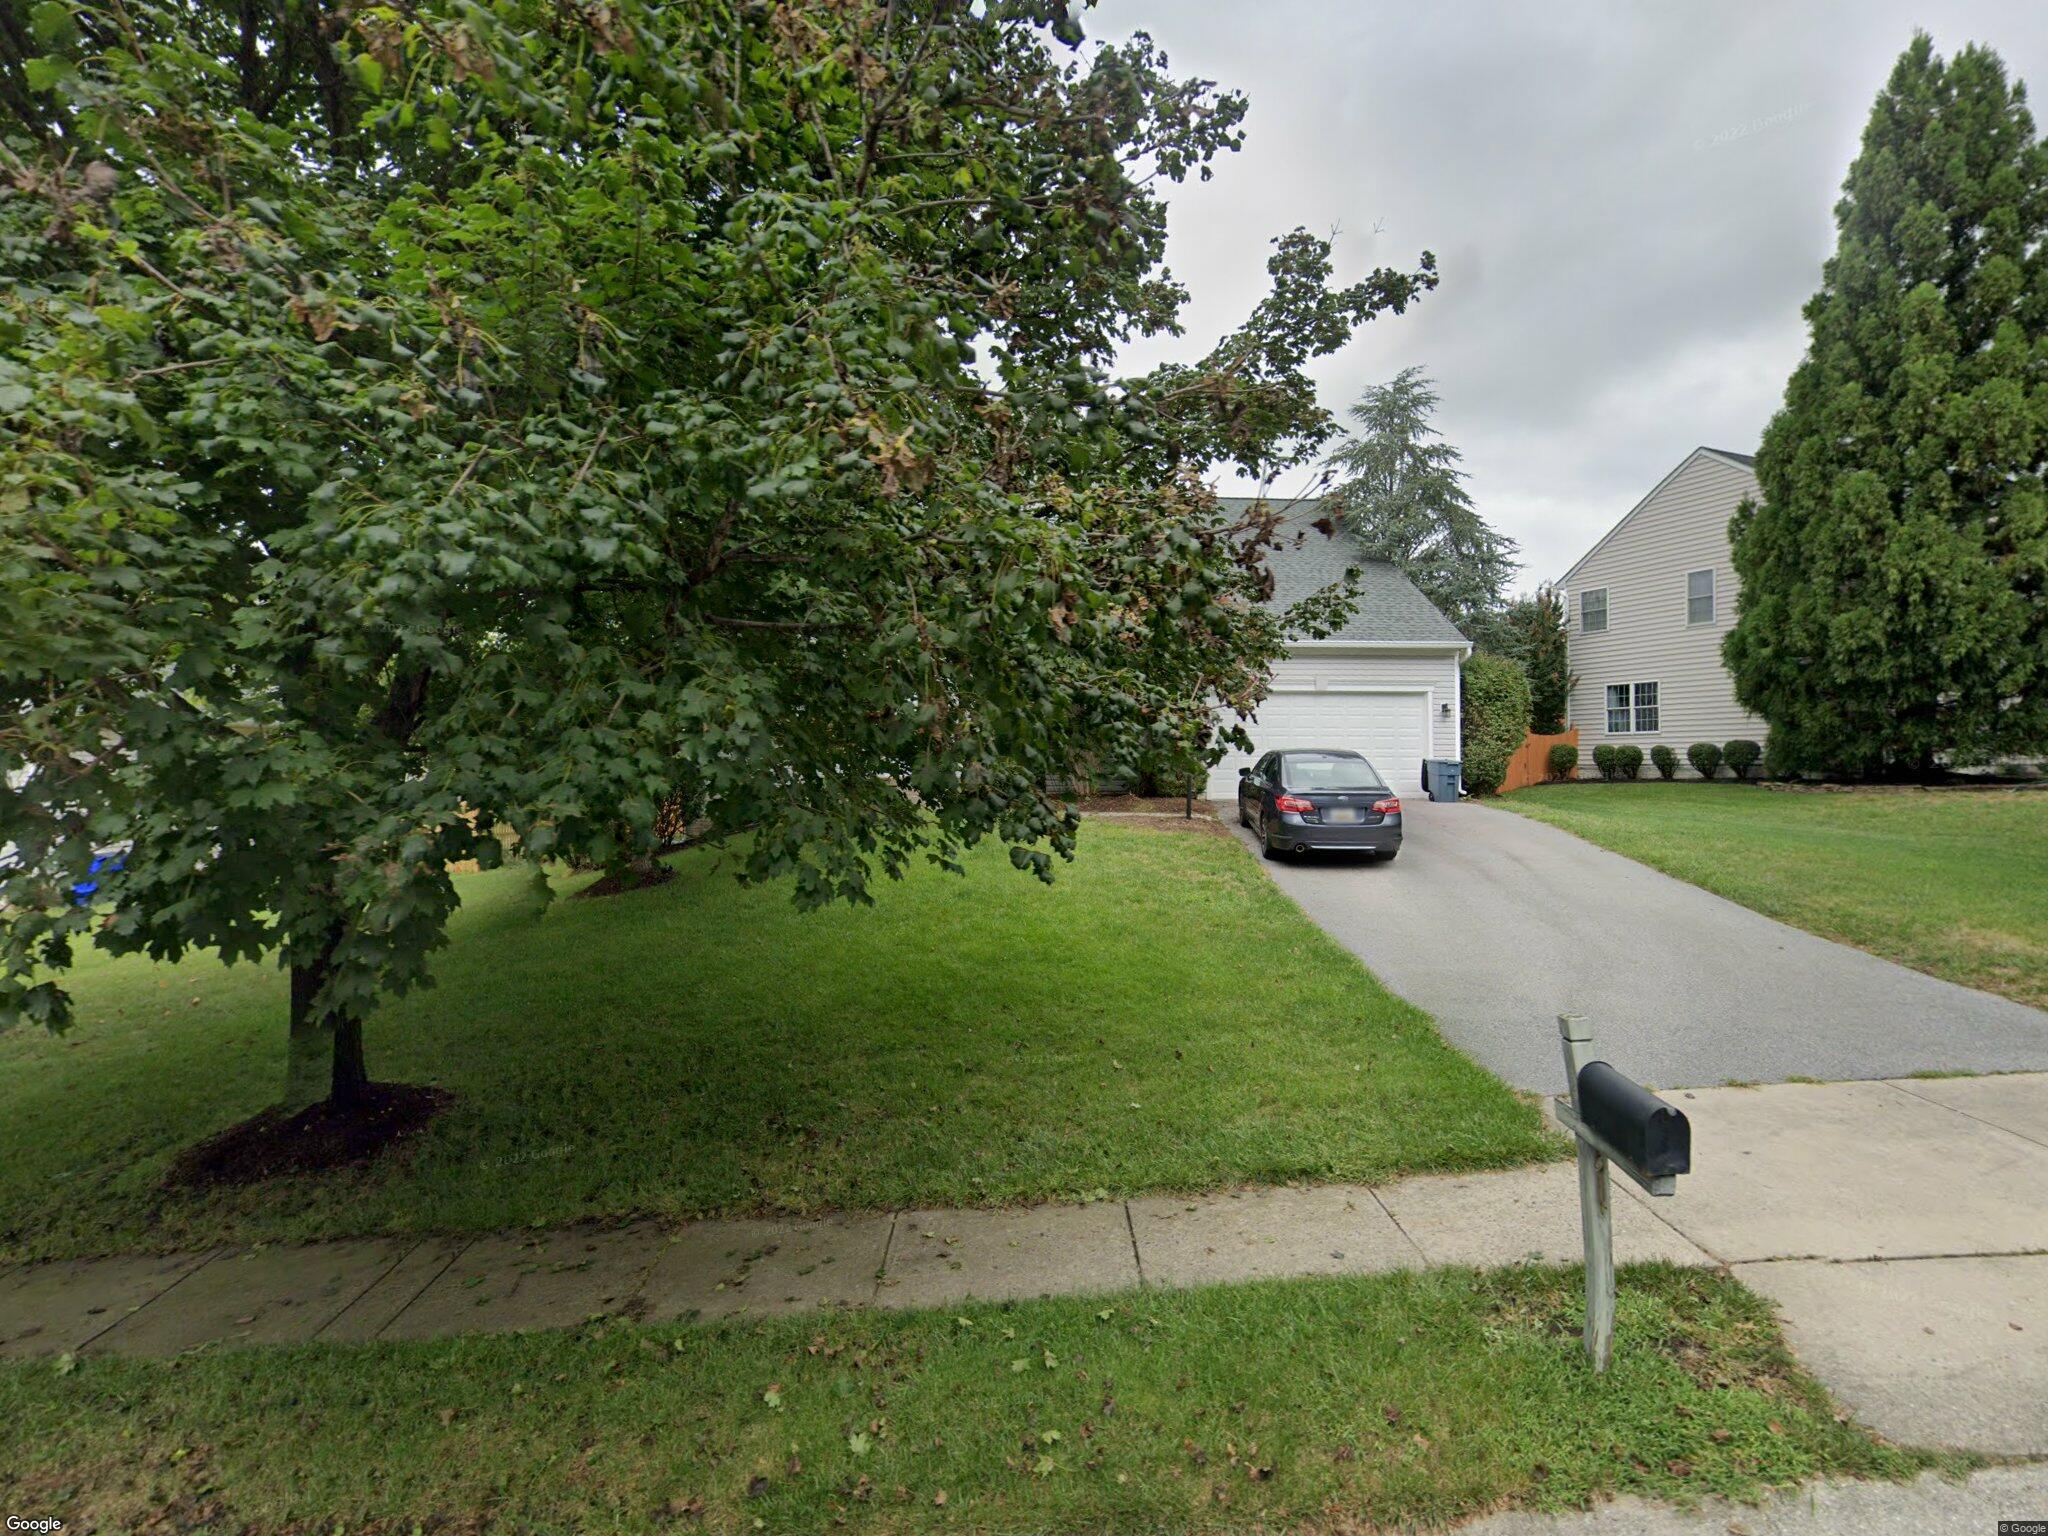 2264 ballard way, ellicott city, md 21042 | trulia